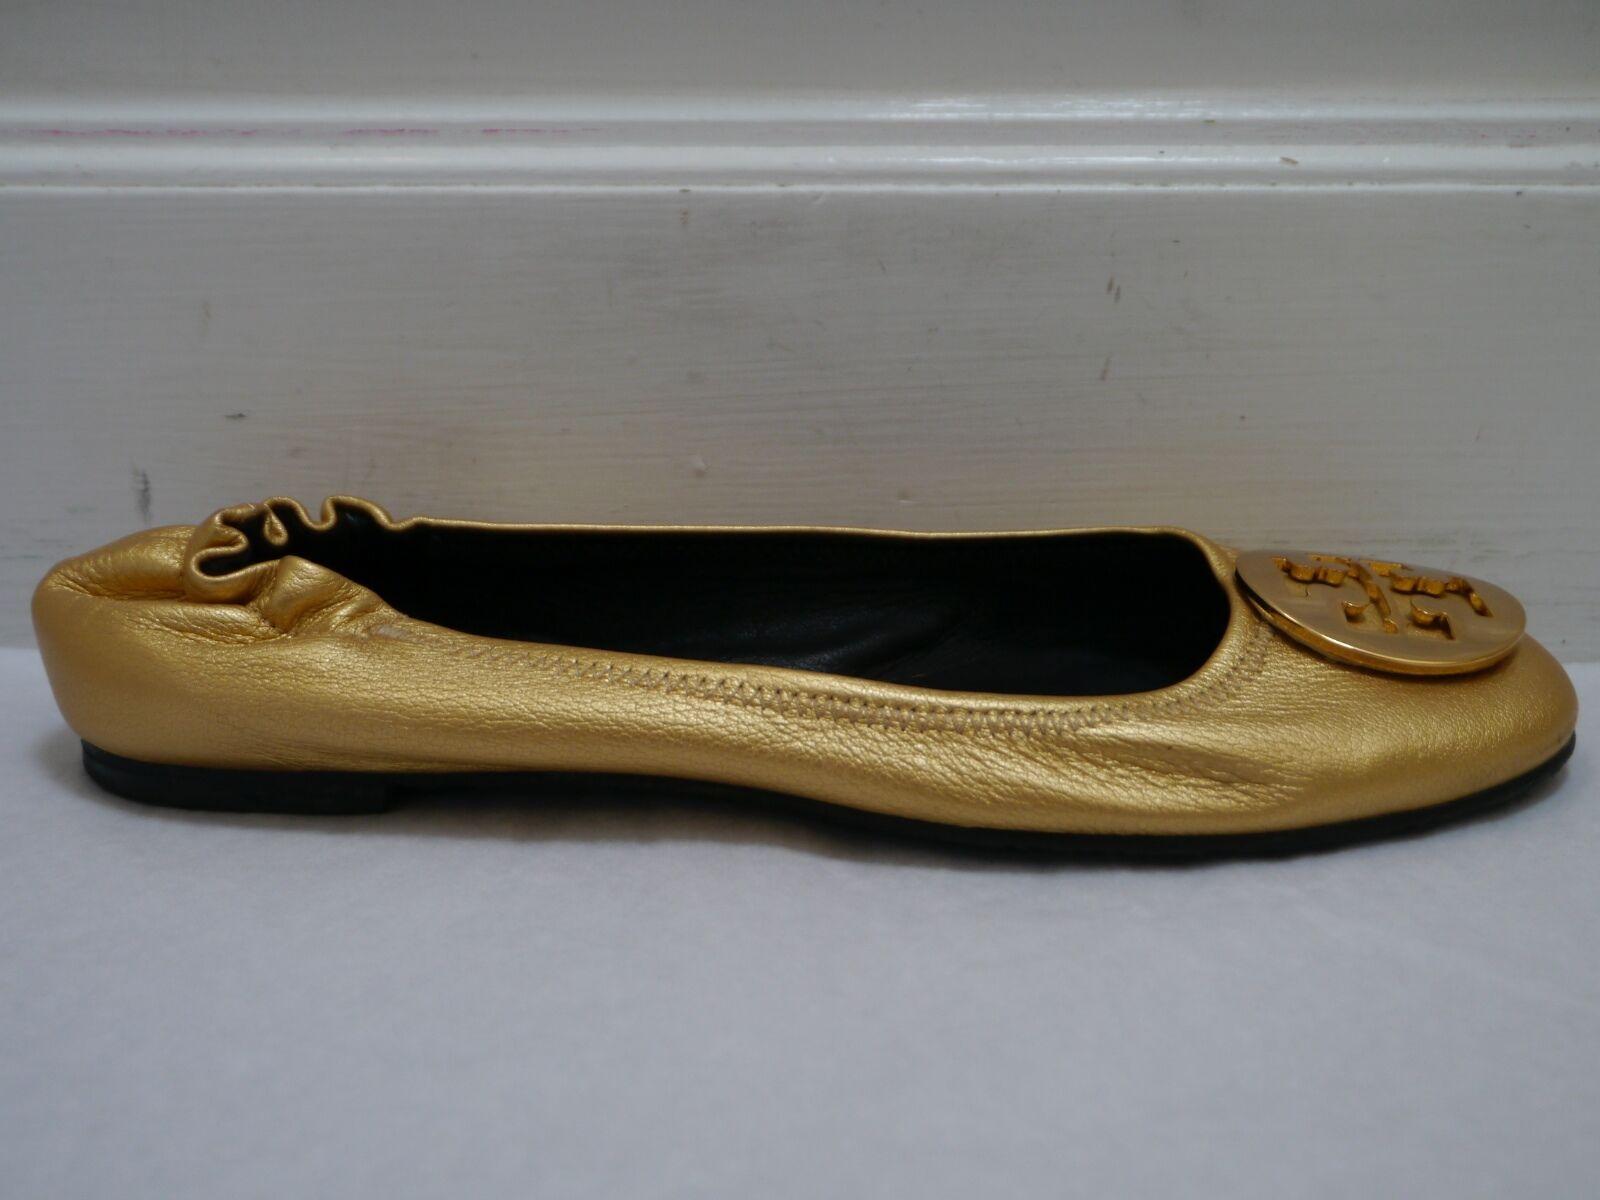 TORY BURCH Reva gold leather logo detail detail detail ballet flats shoes size 8.5 5bbb54